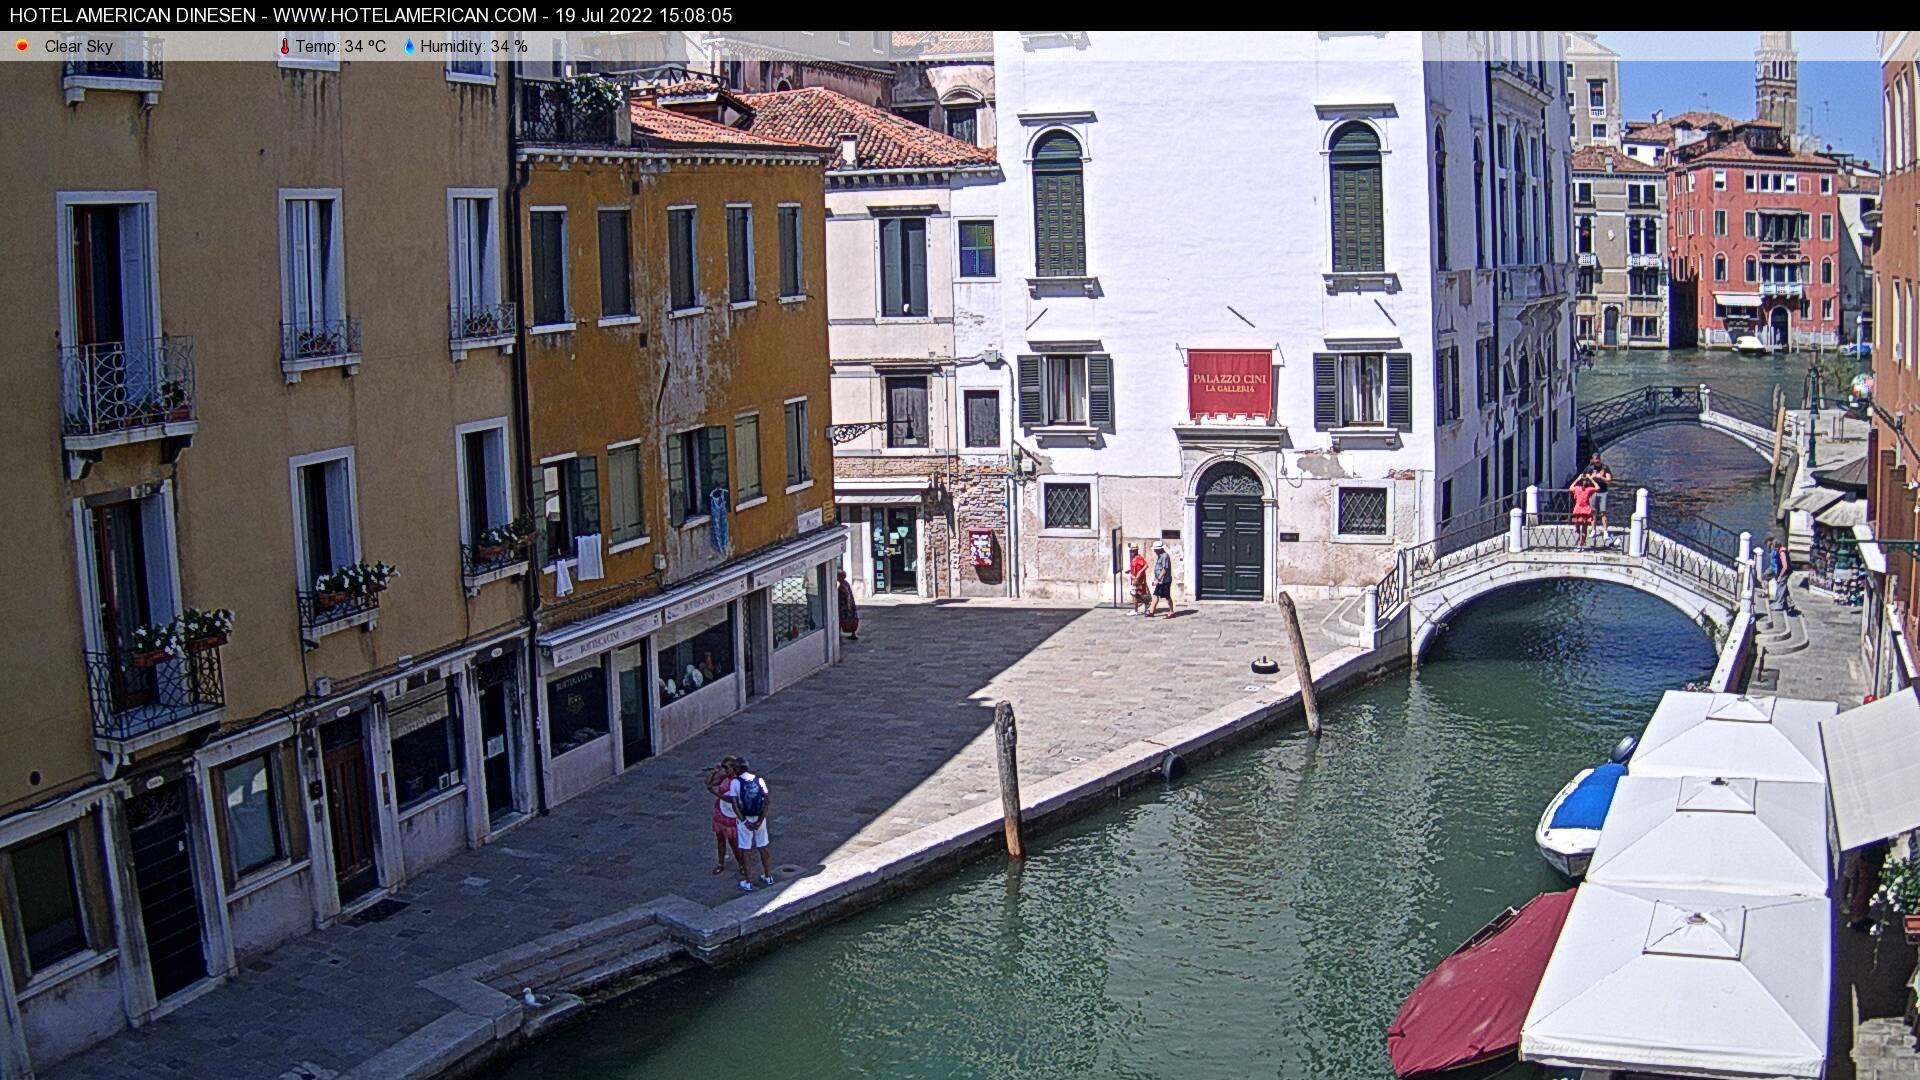 Venedig Sa. 15:08